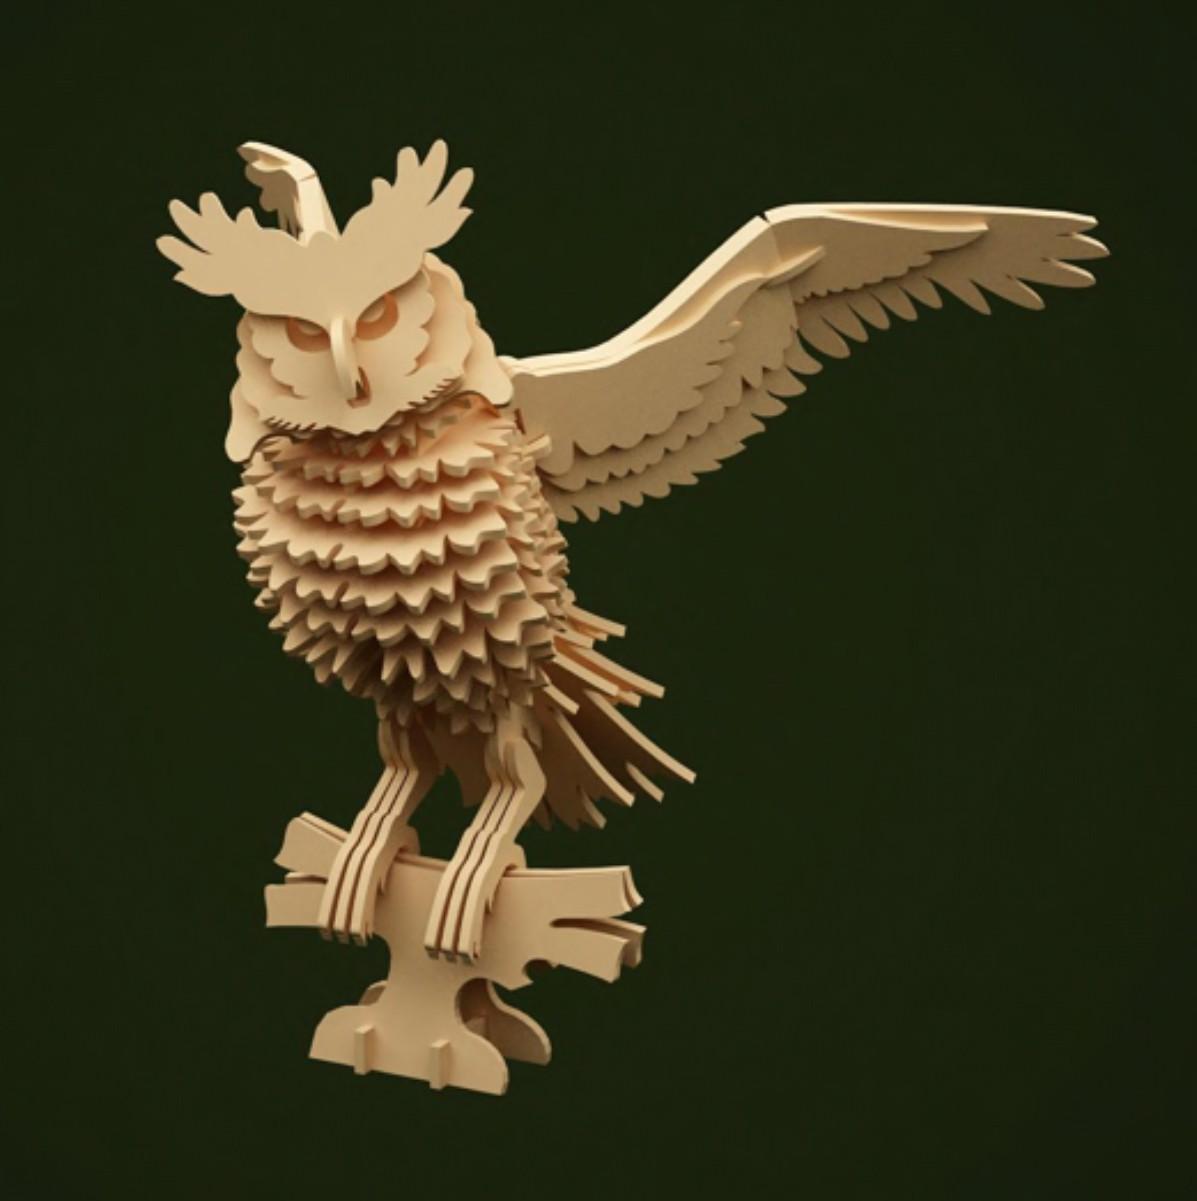 laser cut models owl download free 3d constructor